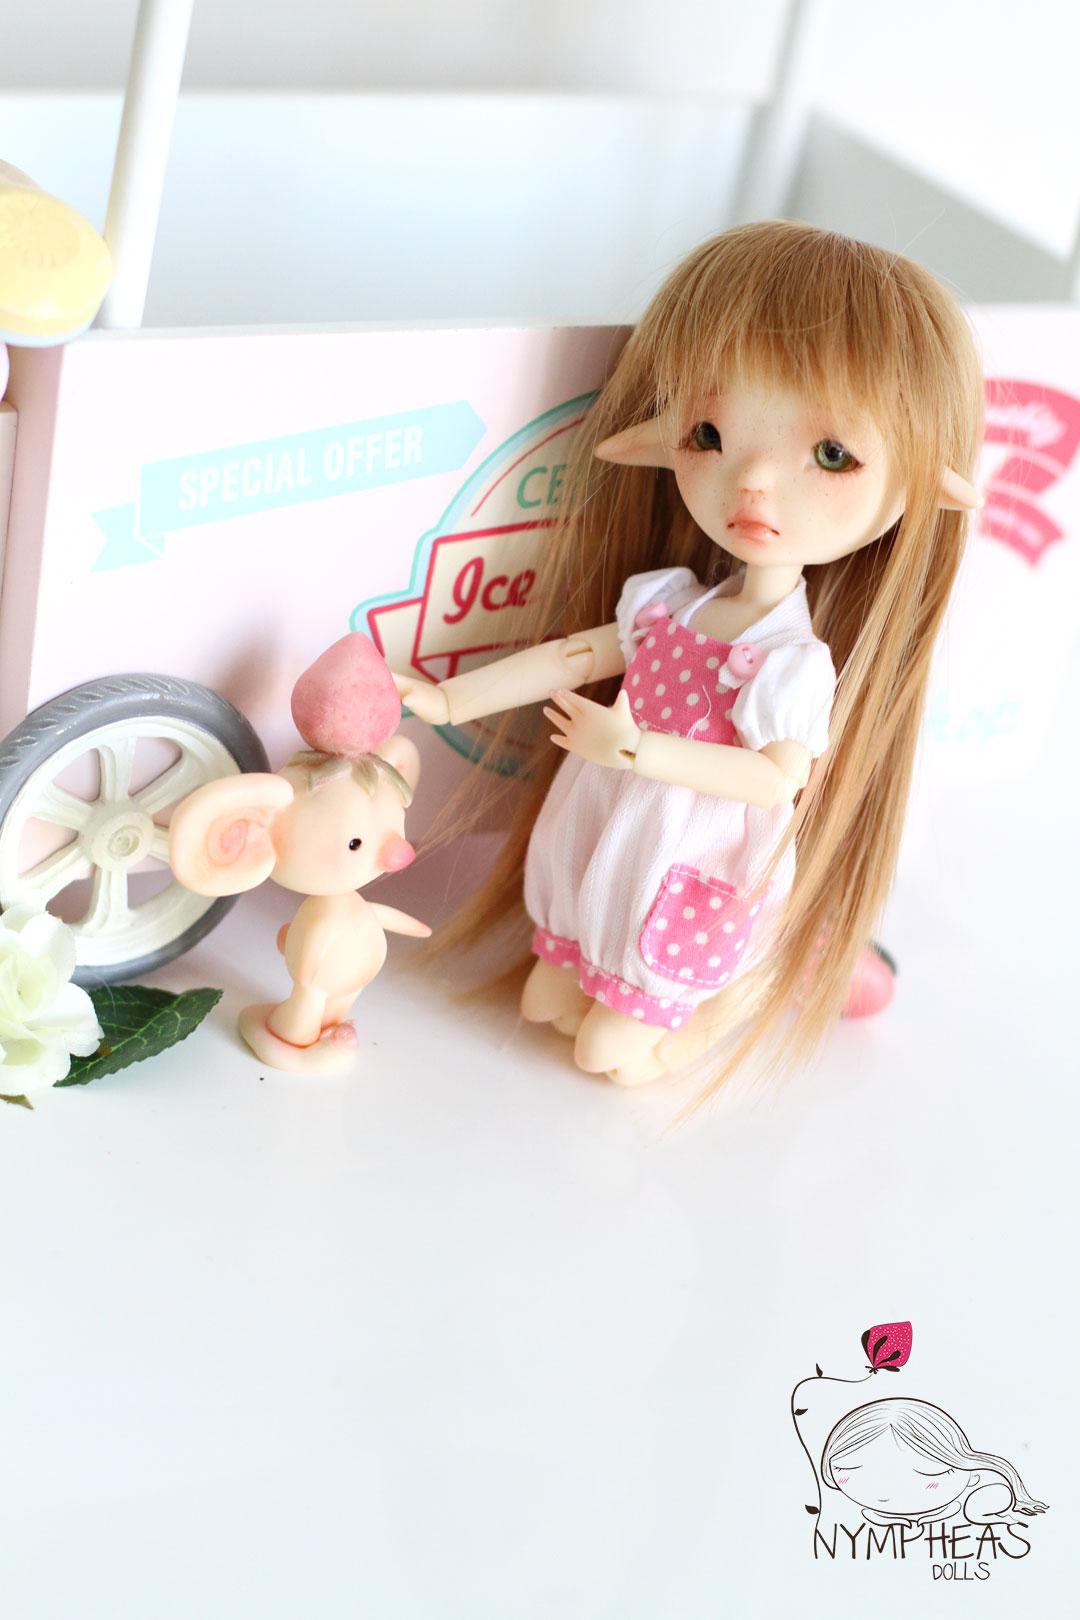 [NYMPHEAS DOLLS] Tit'herbe & Tit'Fleur Snow P35 - Page 5 Malicie-cream-nympheas-dolls-029